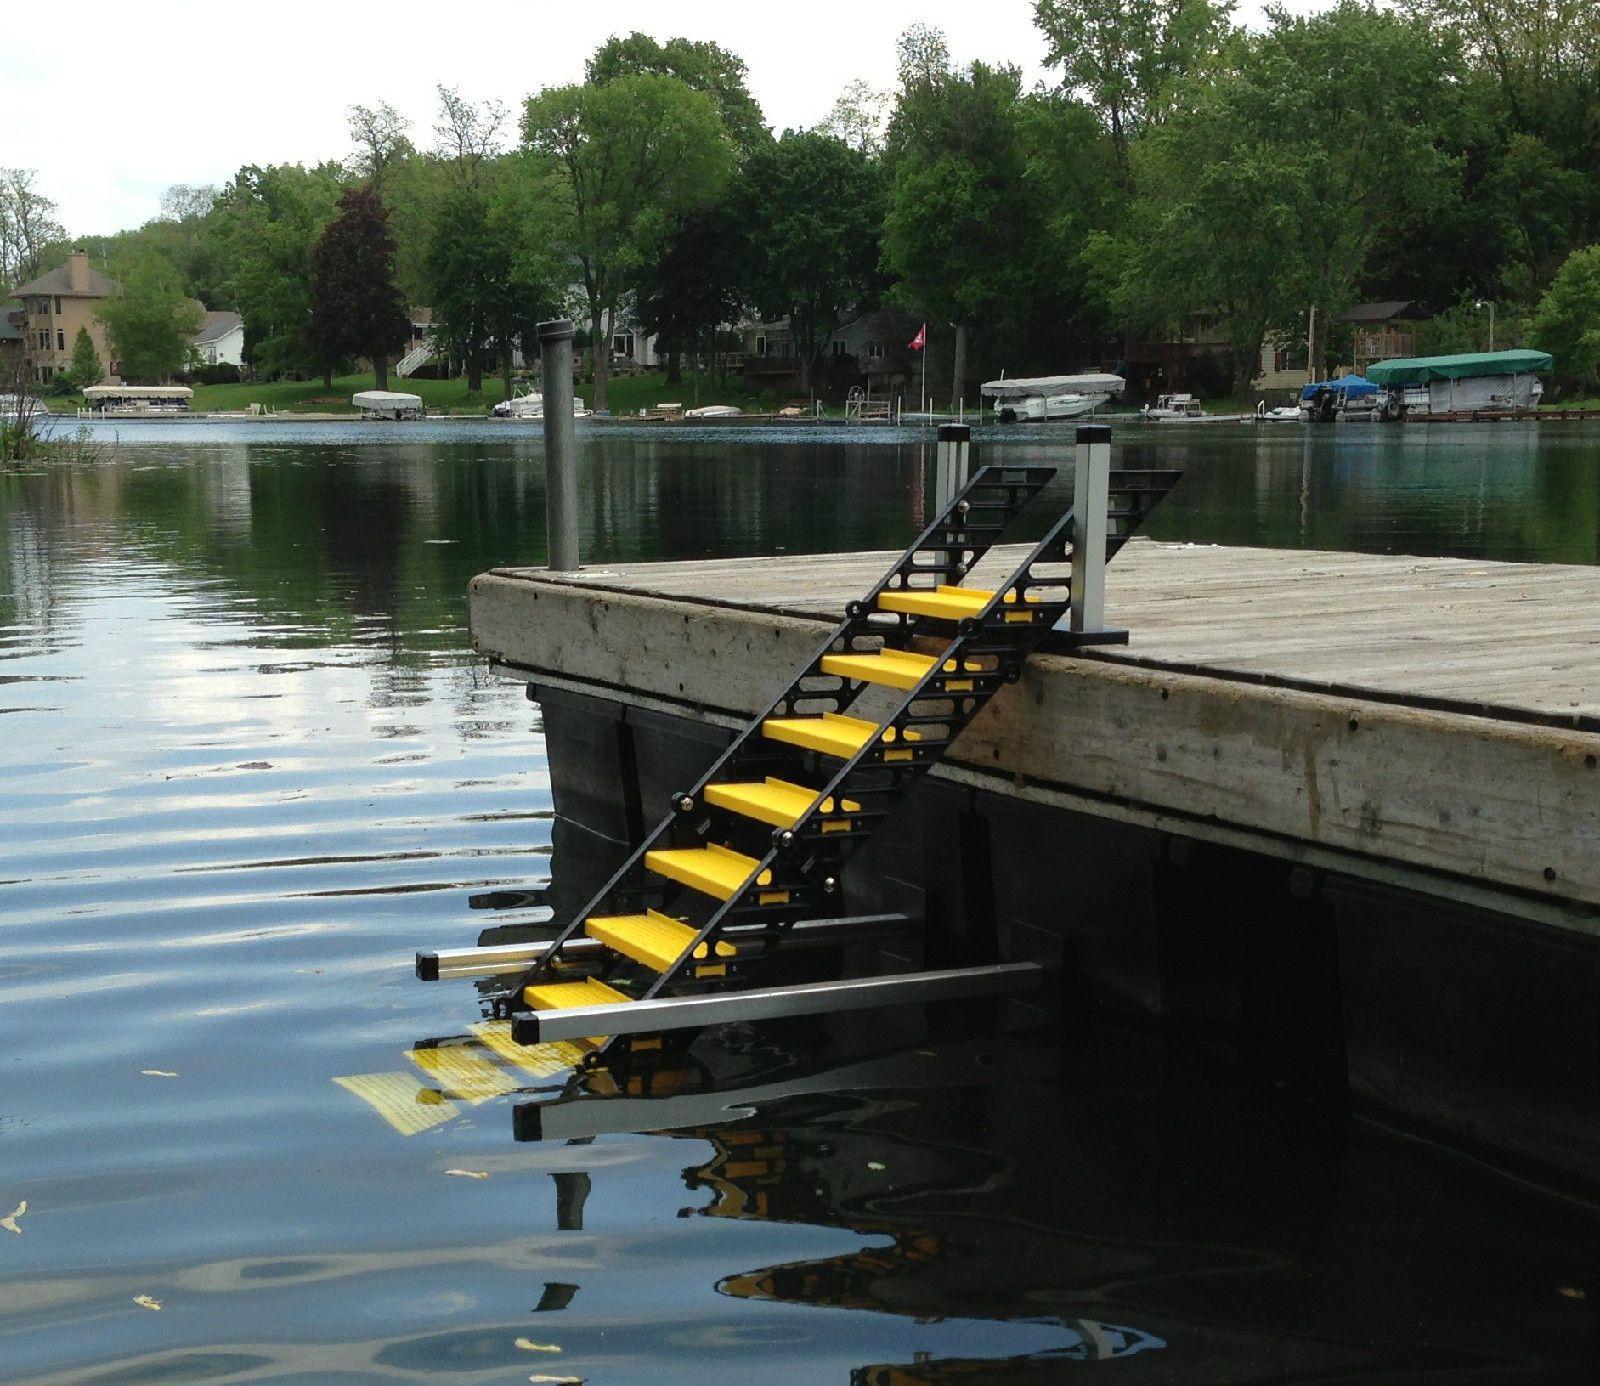 Wag Dog Boarding Steps For Docks Vs Ladders Ramps Platforms Lake House Lakefront Living House Boat